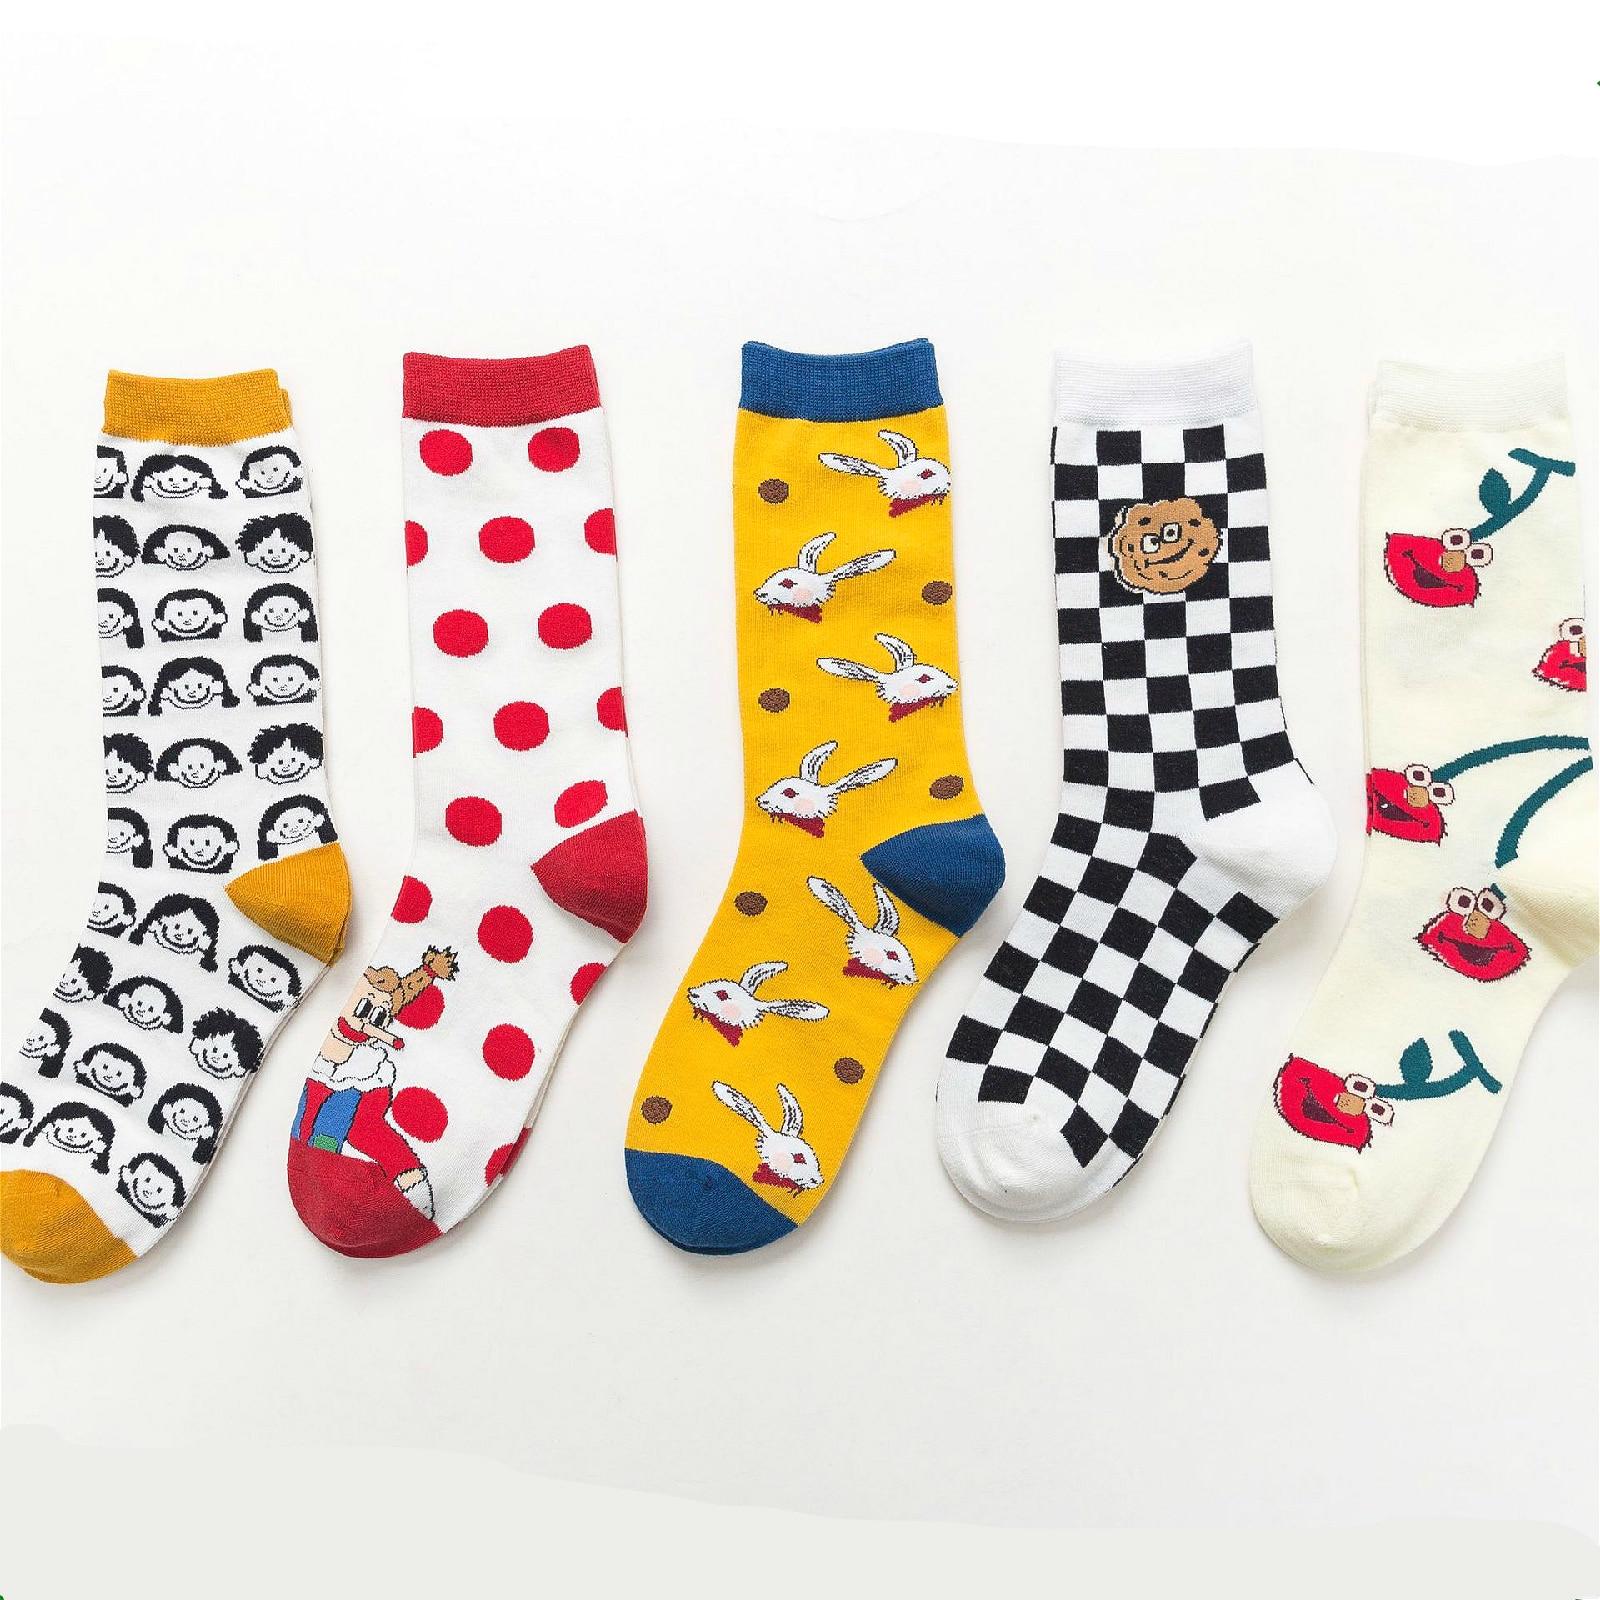 PEONFLY Cute Cartoon Happy Socks Women Lovely Rabbit Printed Casual Comfortable Socks Cherry Plaid Kawaii Motion Socks Femme